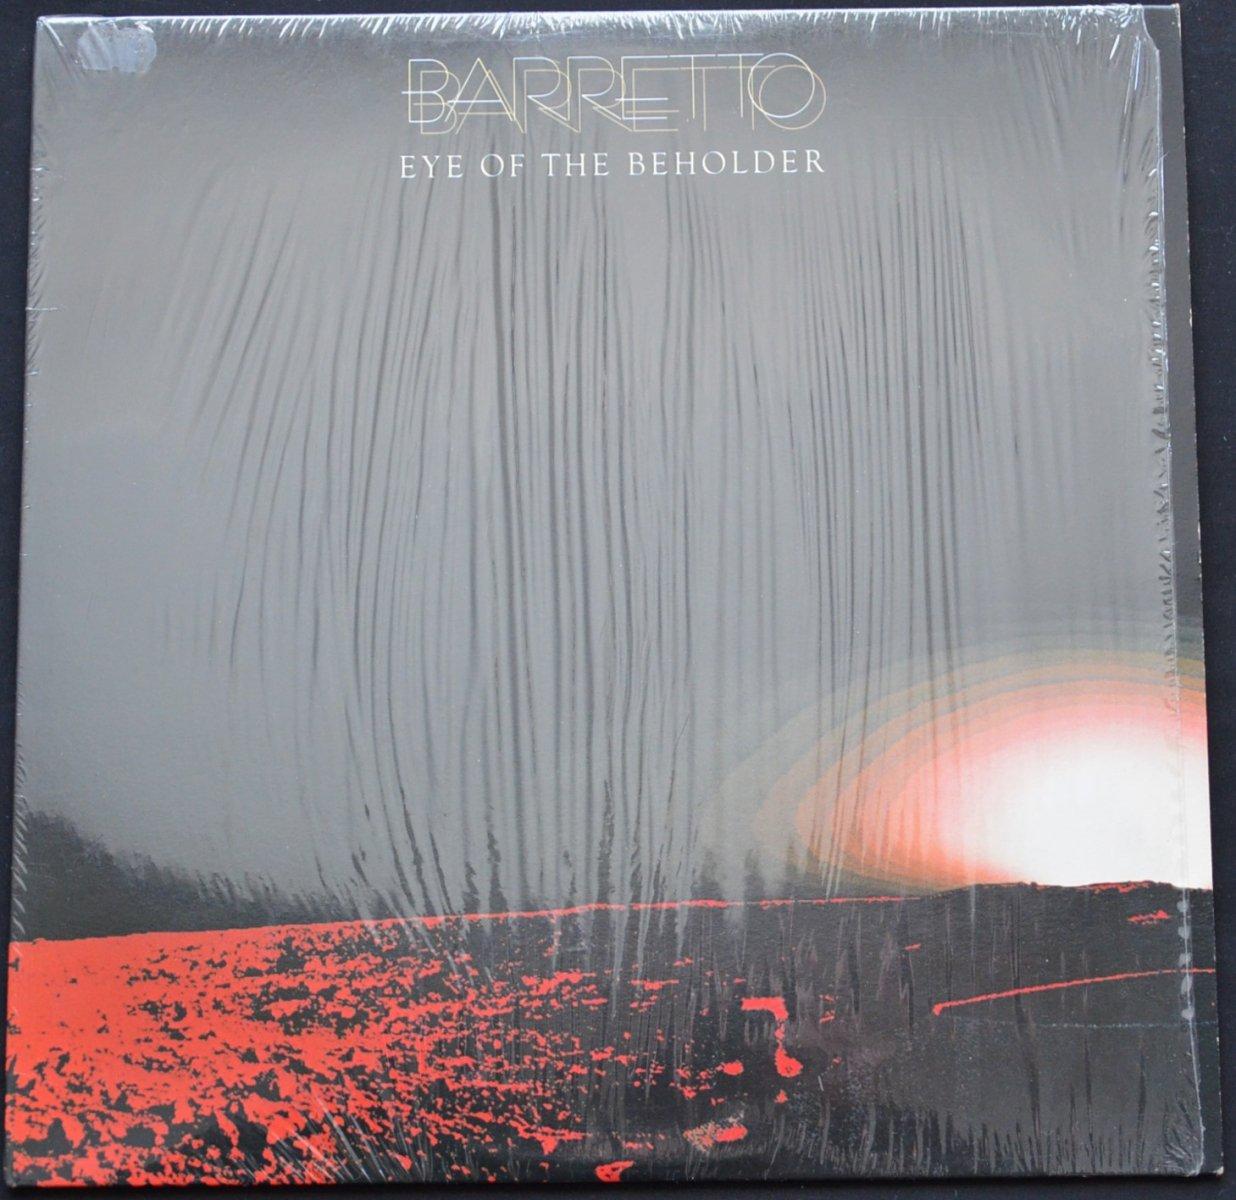 BARRETTO (RAY BARRETTO) / EYE OF THE BEHOLDER (LP)